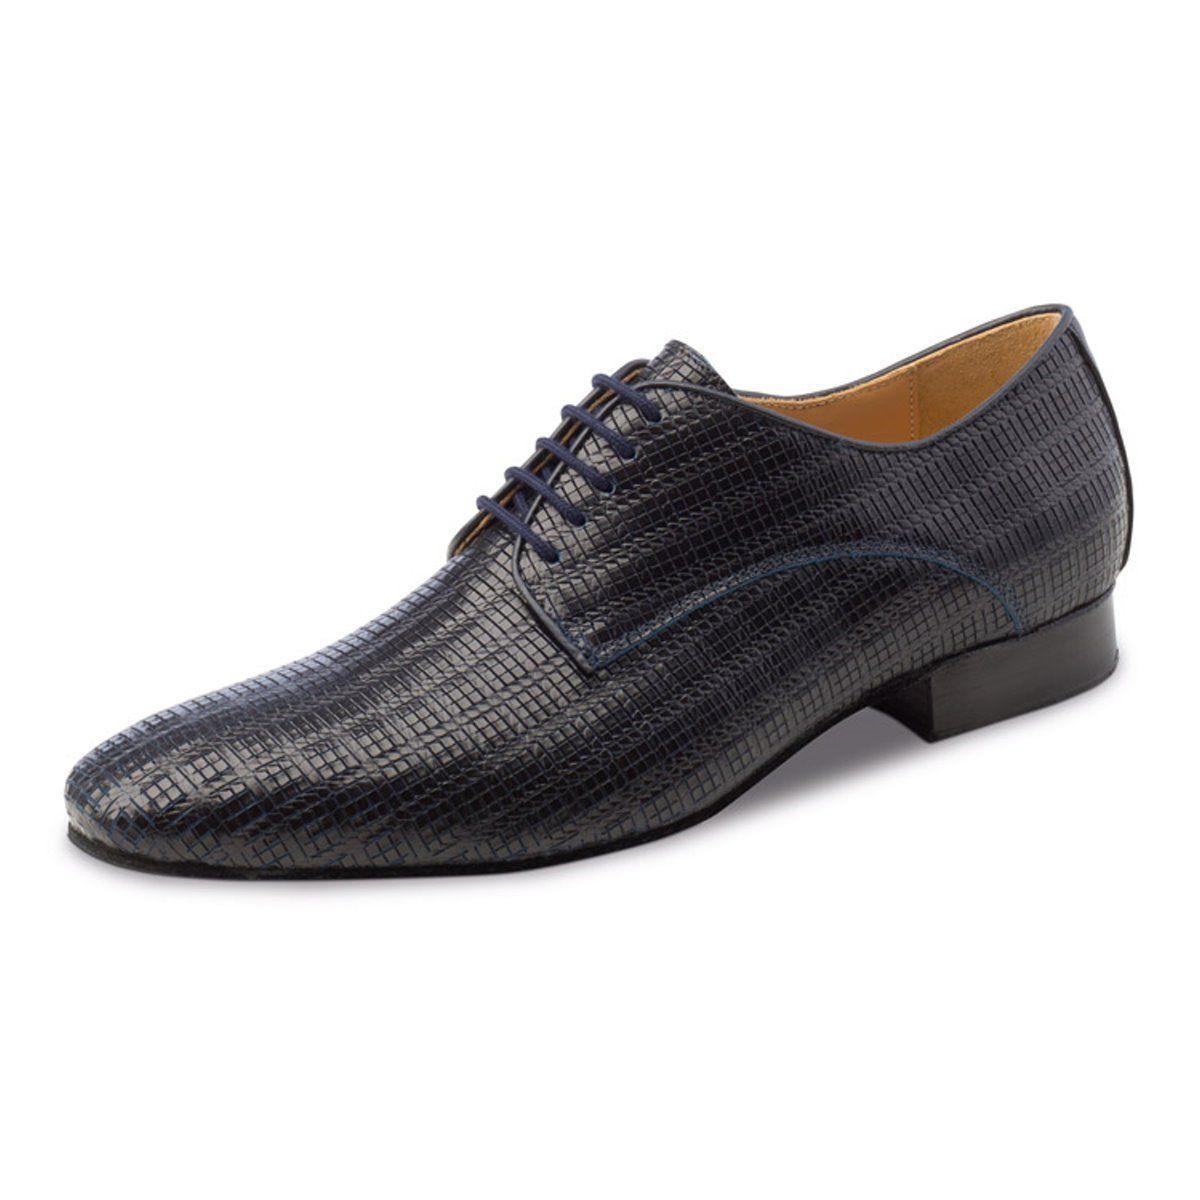 Zapatos negros Werner Kern para hombre ijE8WZnEU